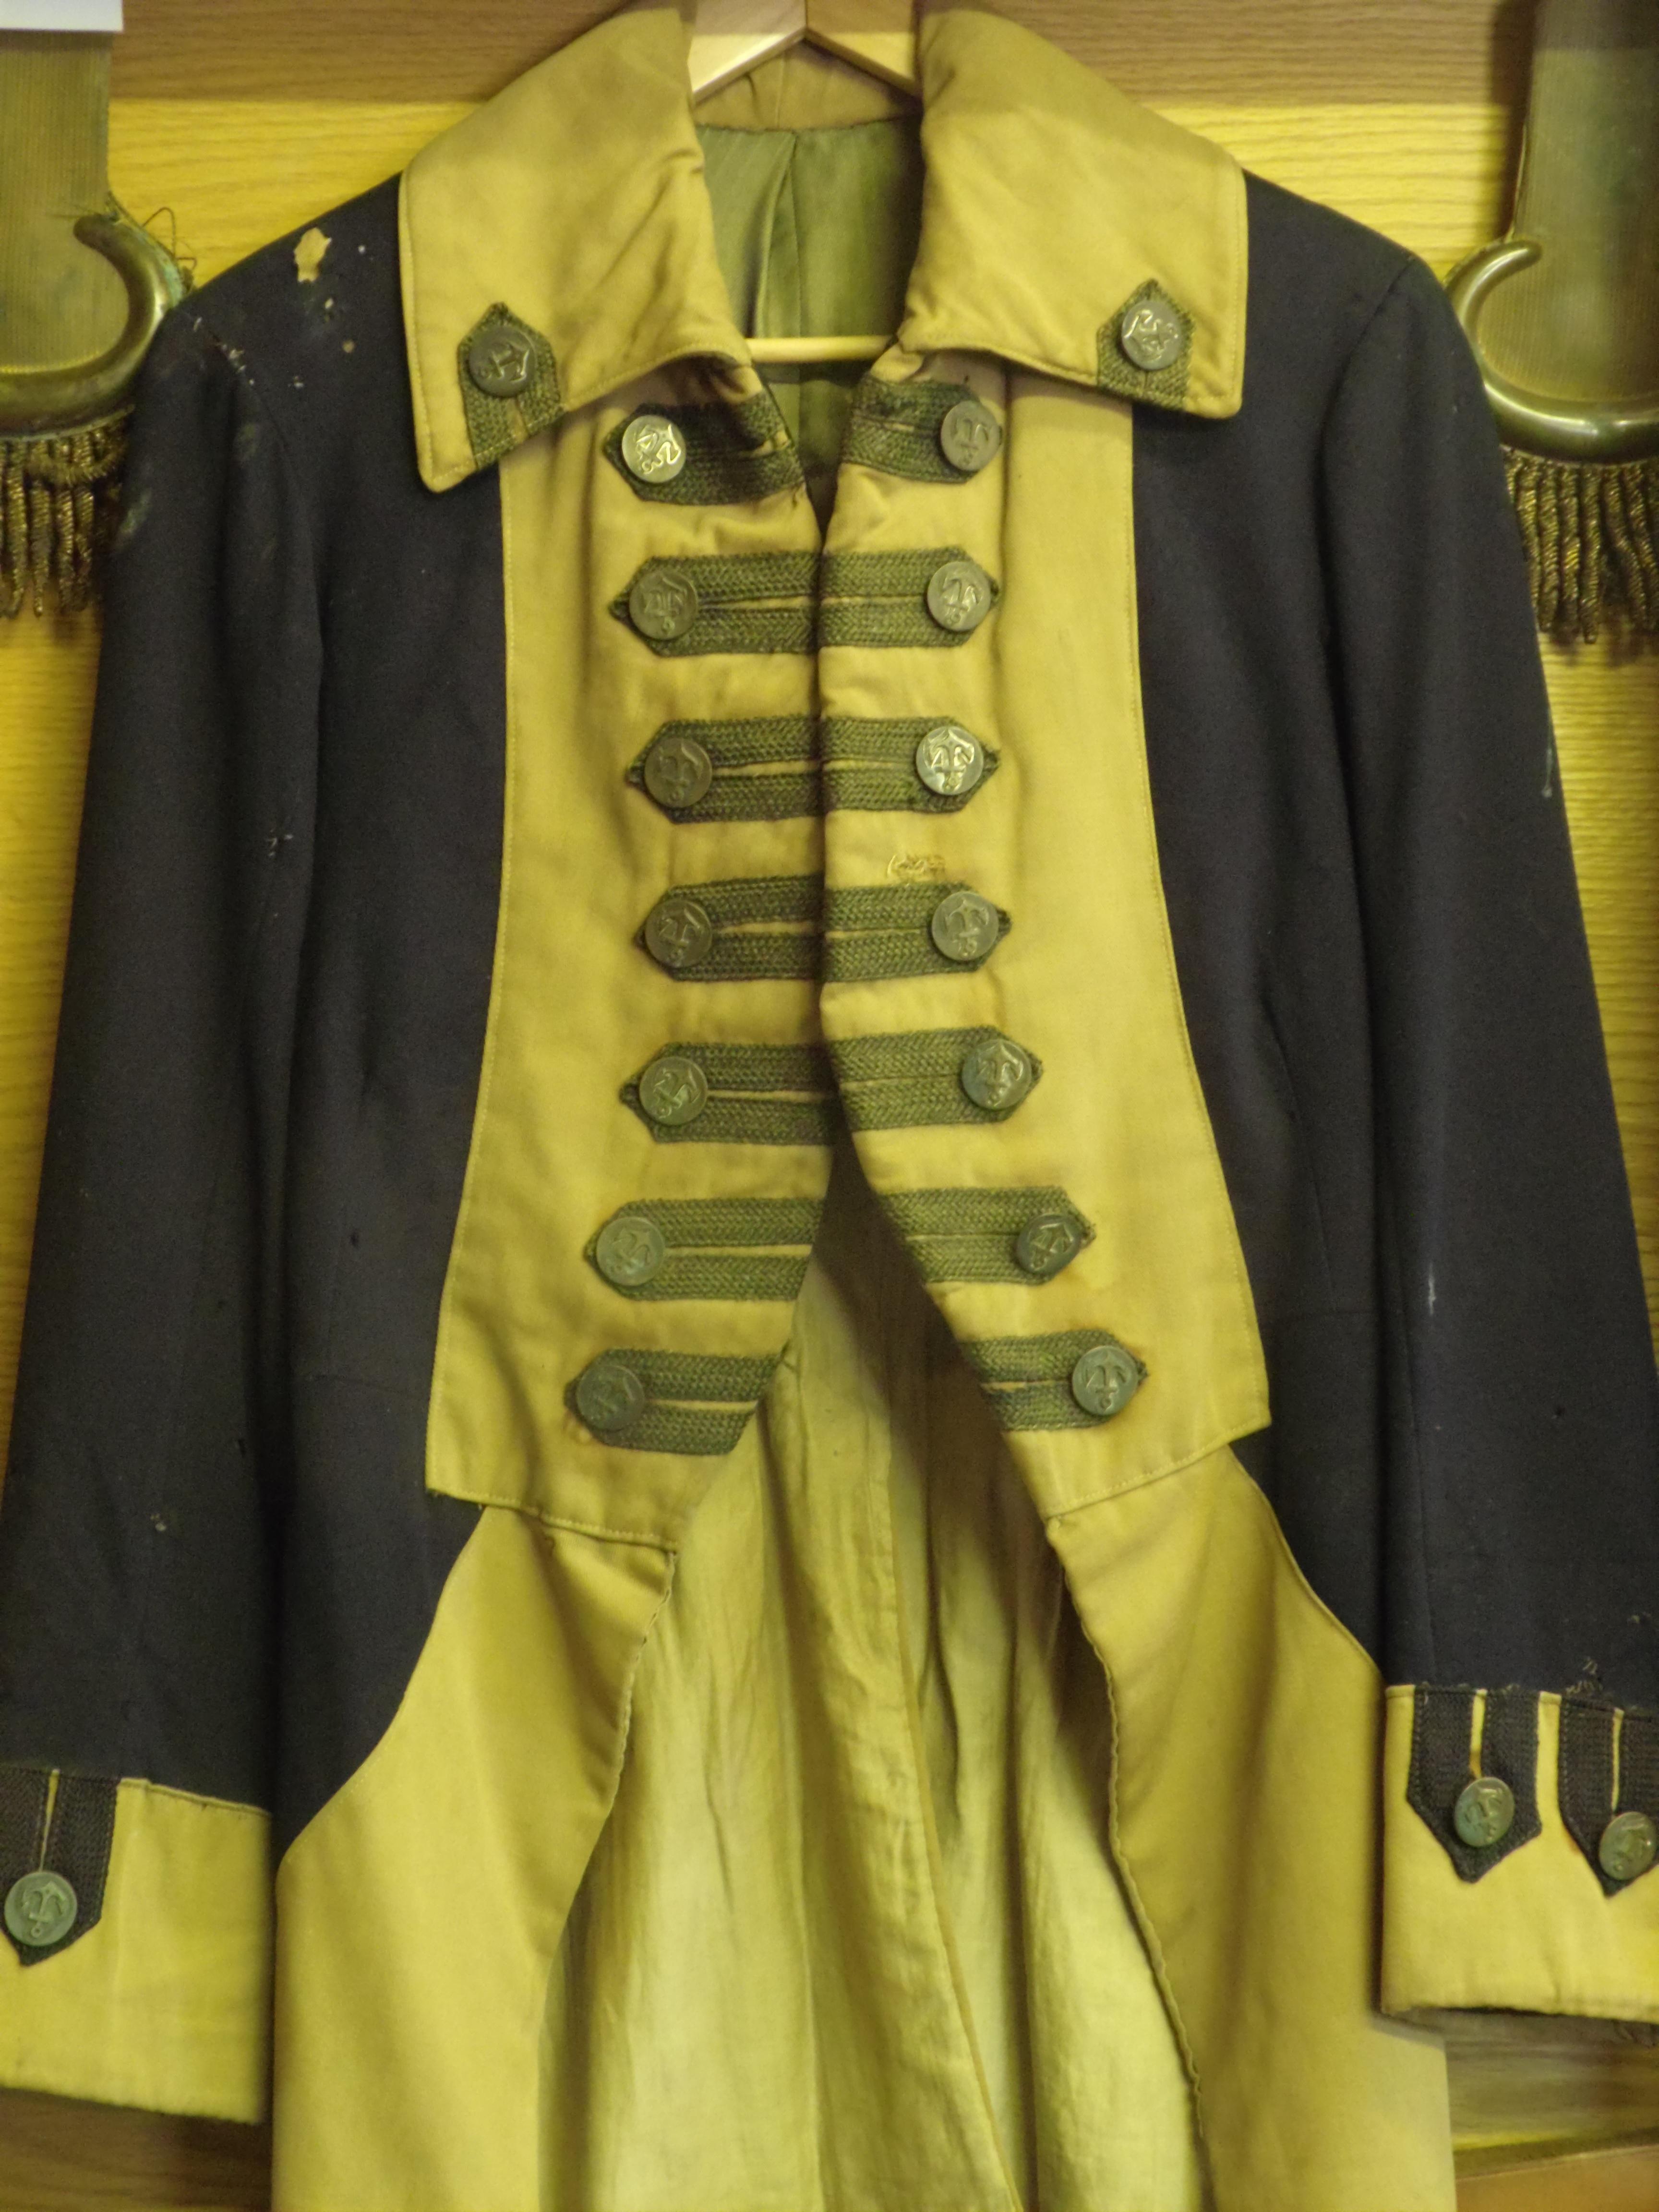 Endearing Military Uniform History Custer Sdpb Radio Military Dress Uniform Comparison Military Dress Uniforms By Country Years wedding dress Military Dress Uniform